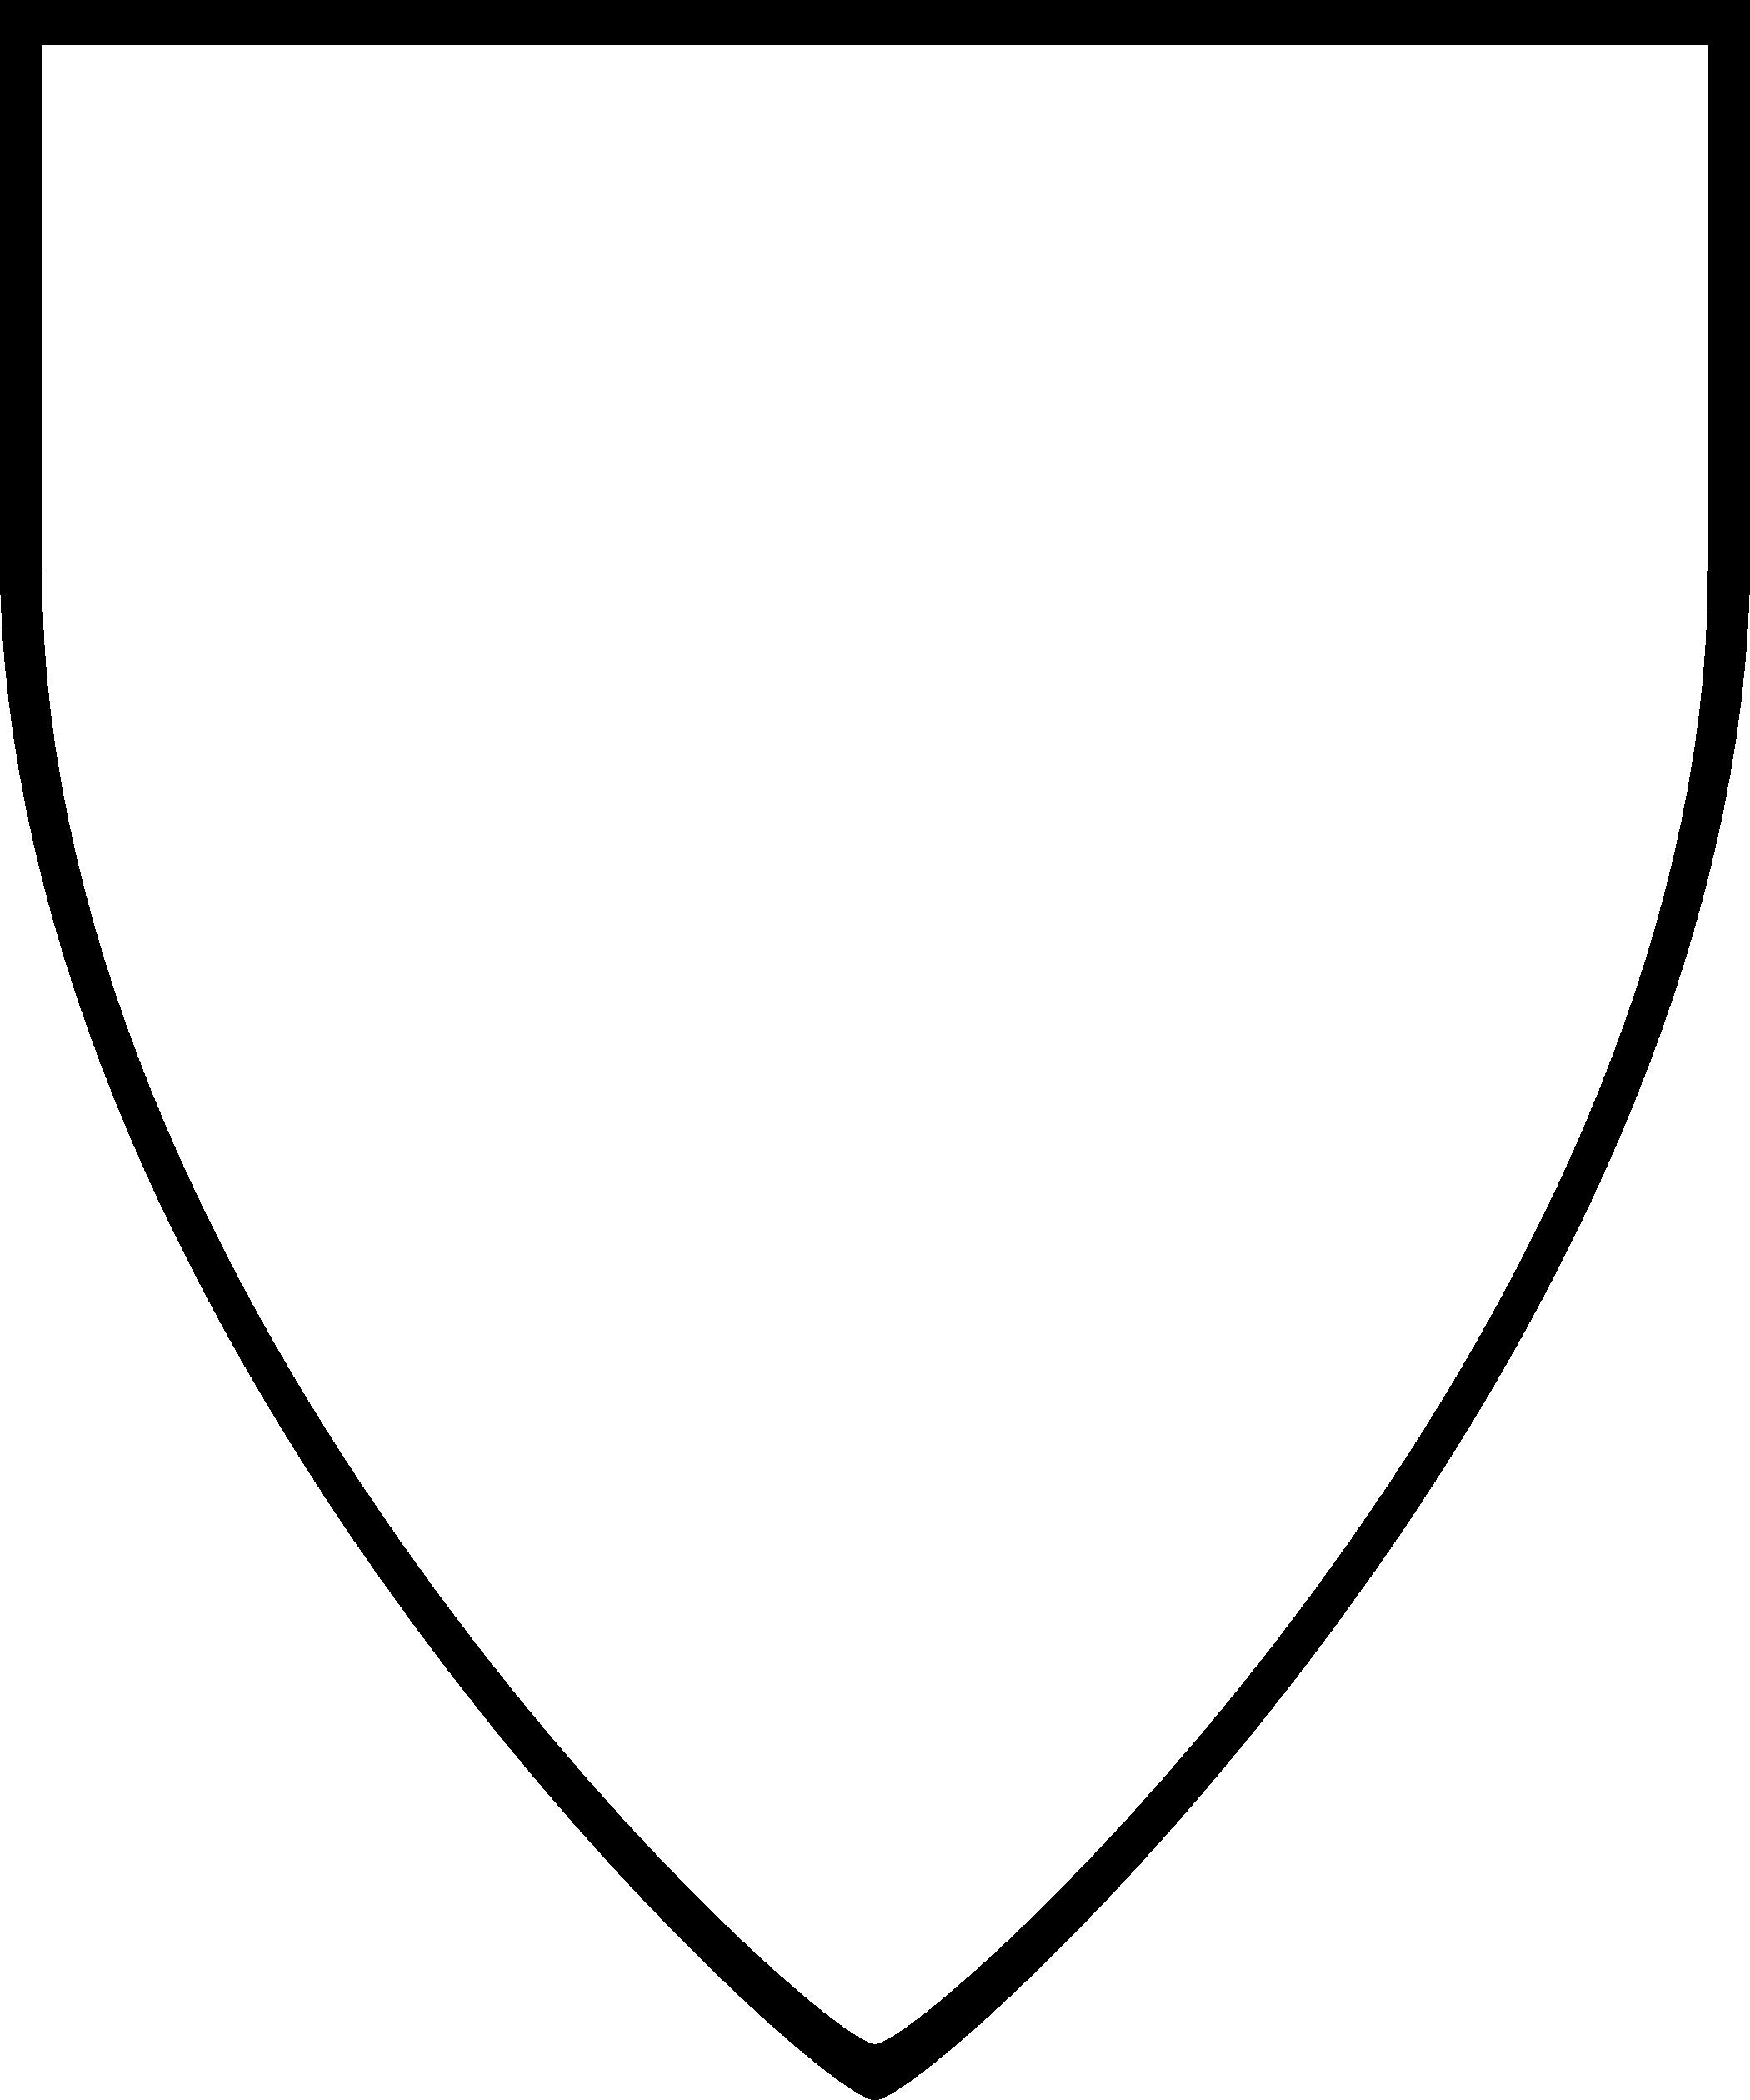 2100x2520 Shield Outline Clipart Panda